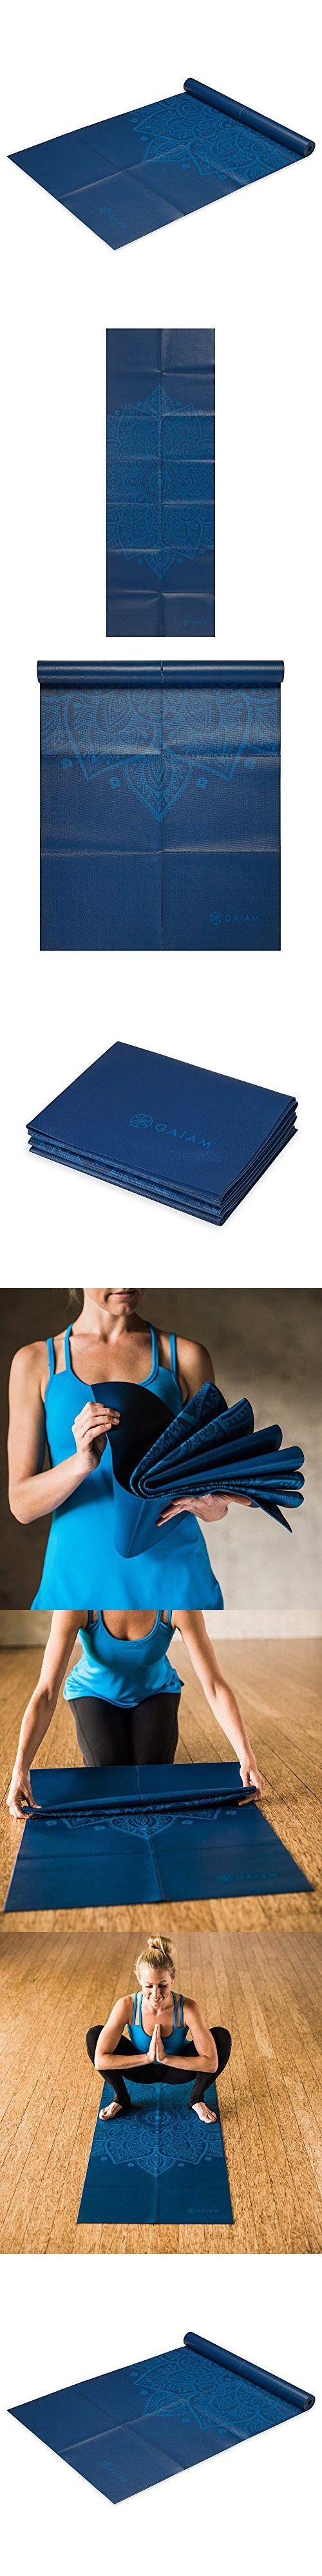 Gaiam Foldable Yoga Mat, Blue Sundial, 2mm